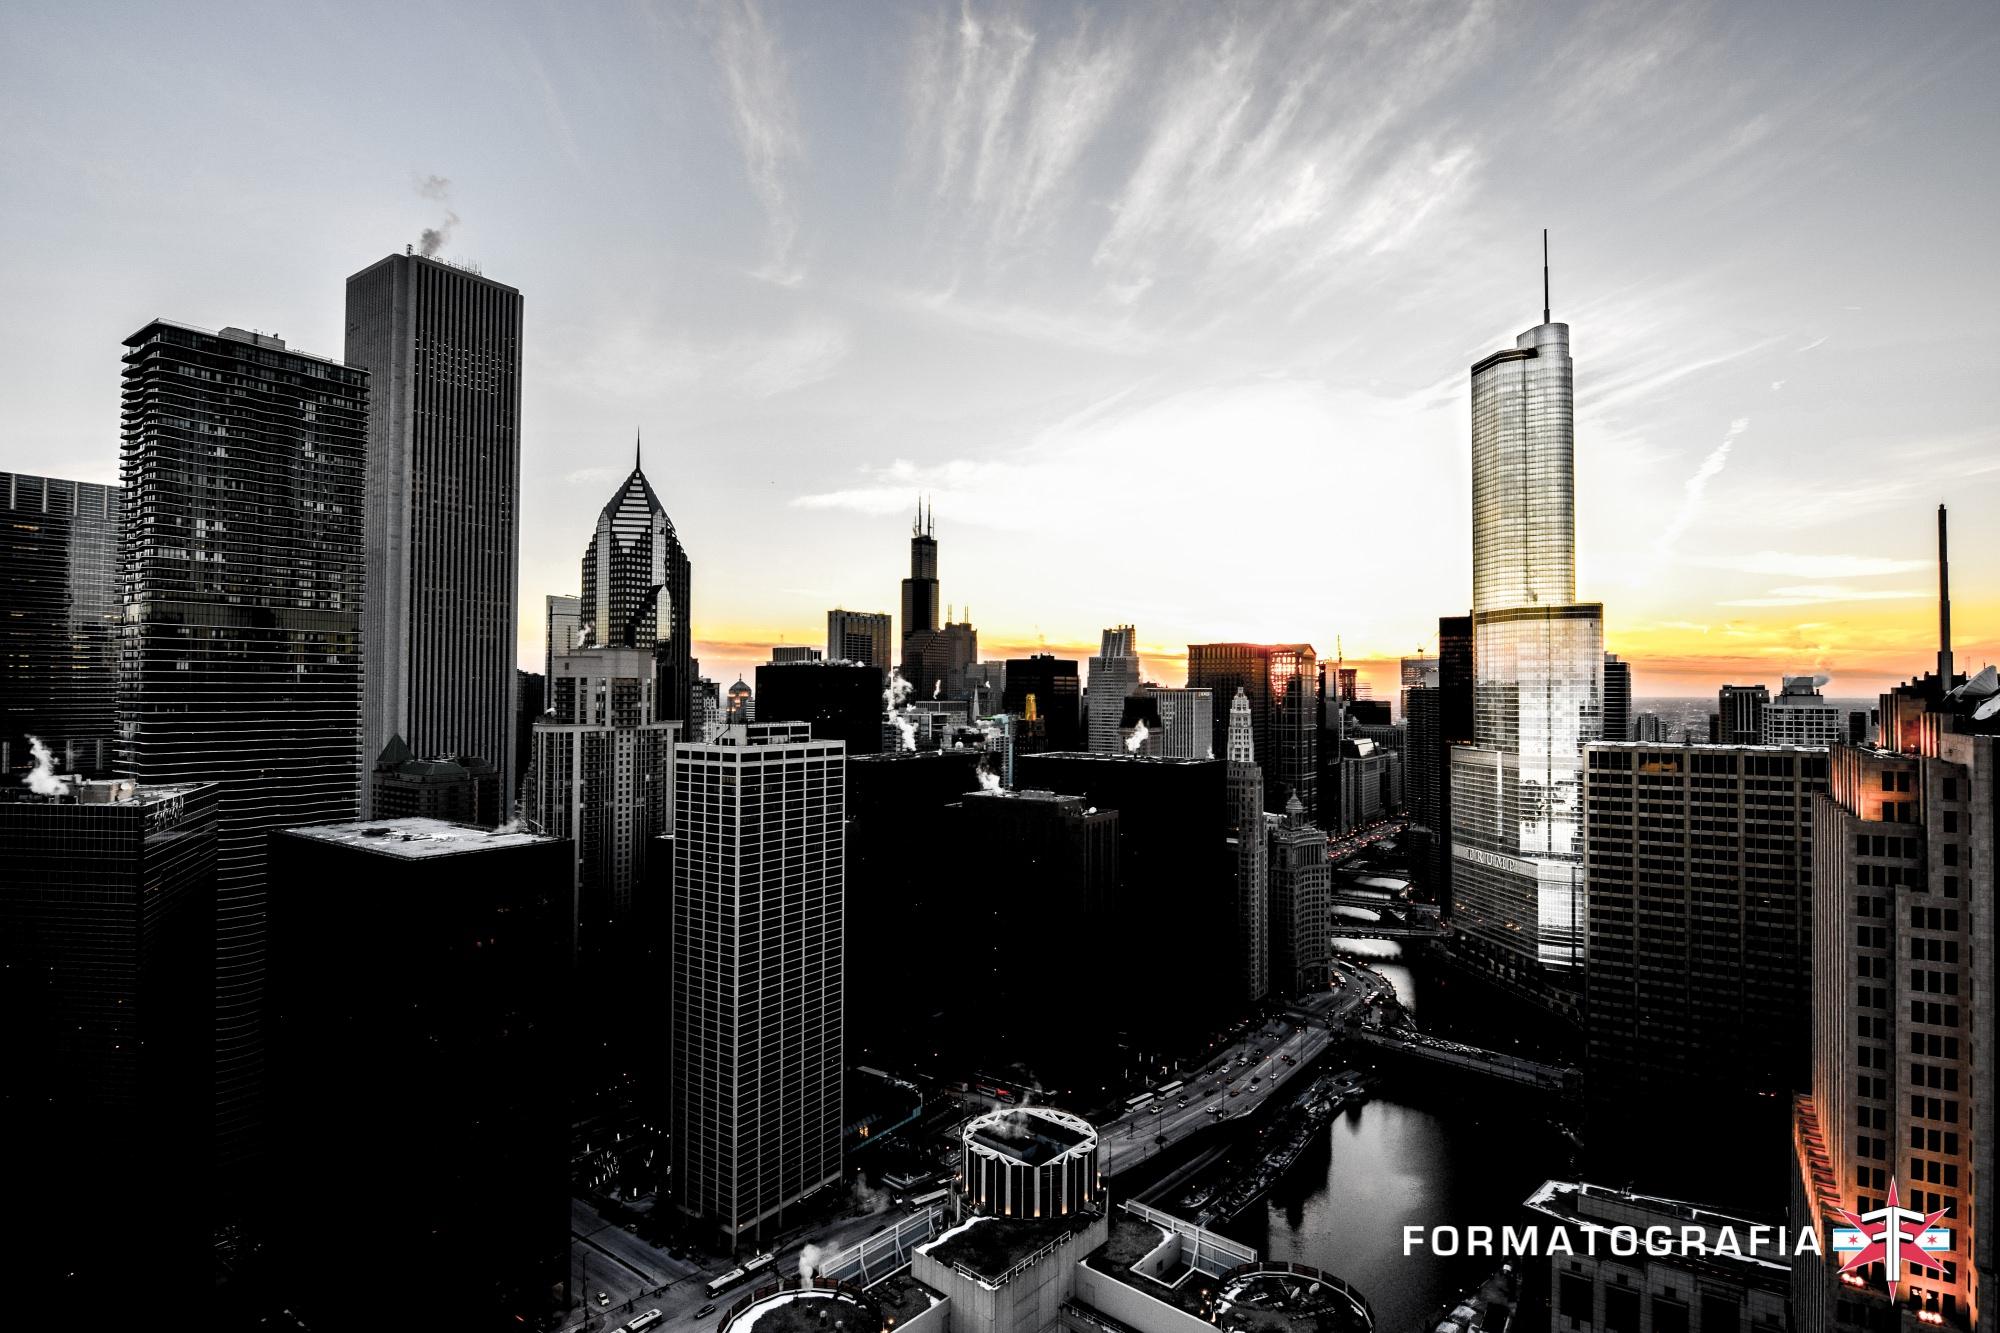 eric formato chicago photographer fall update city architecture shots20160211-DSC_0428.jpg